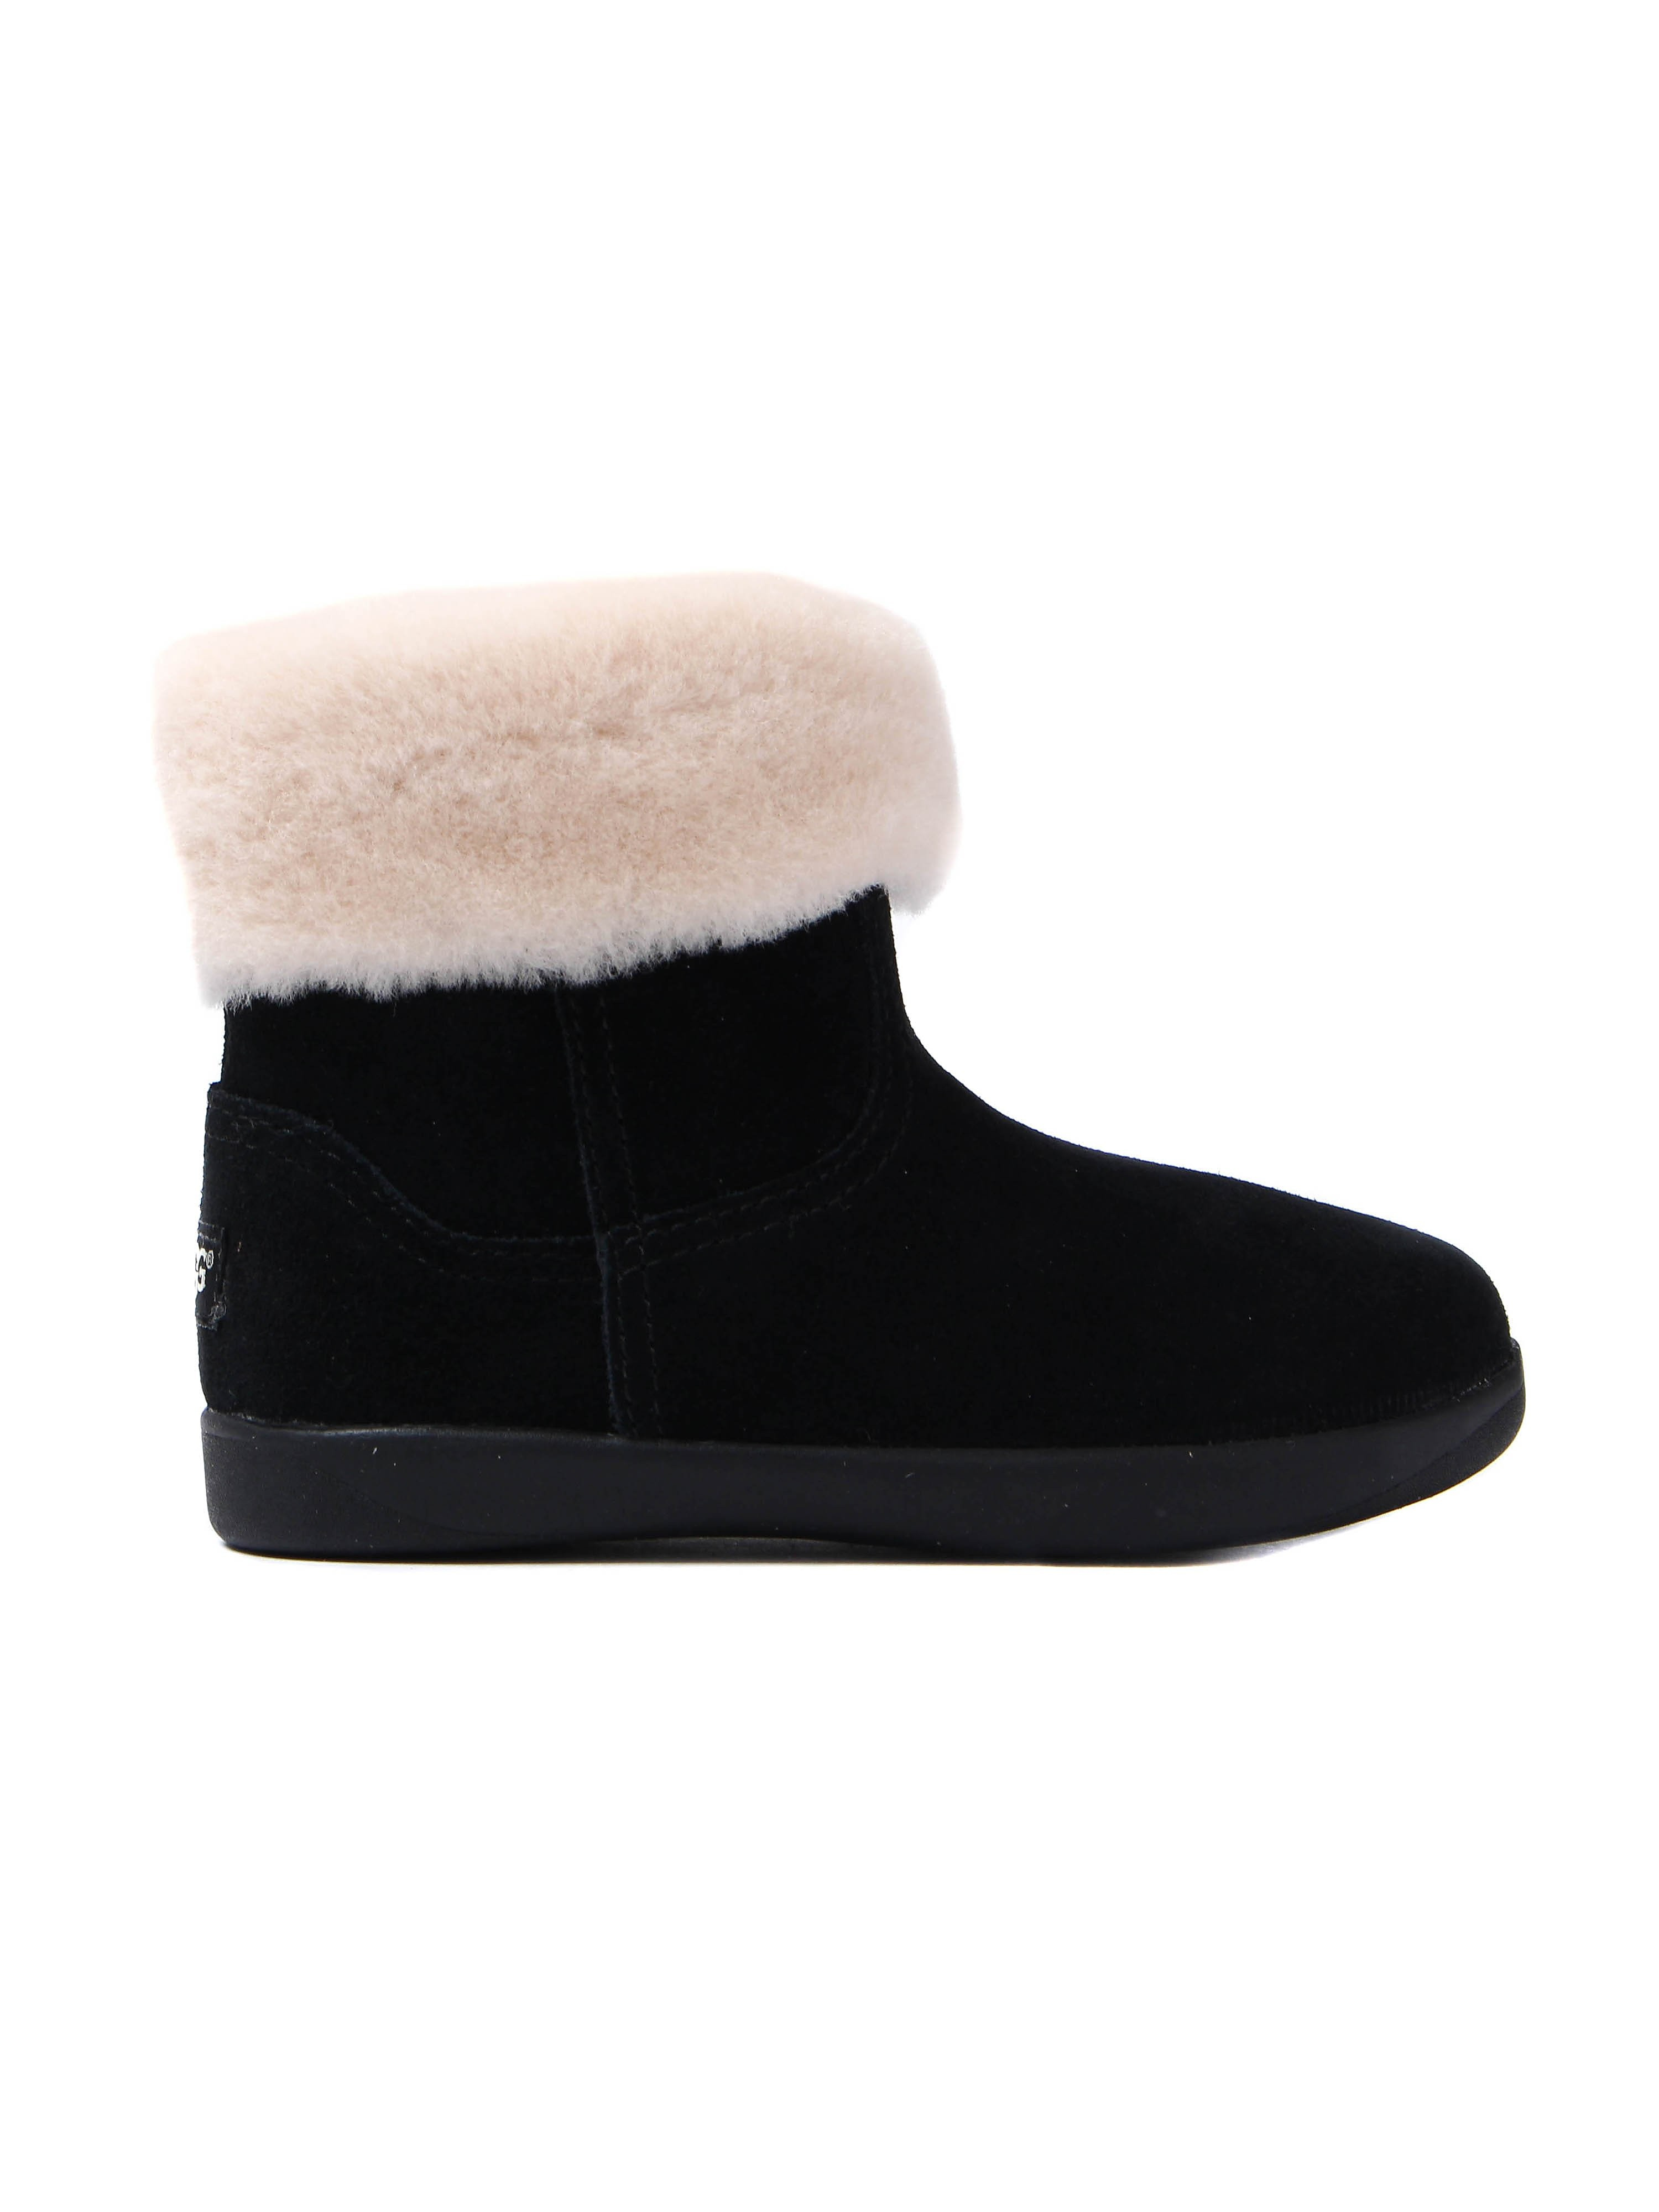 UGG Infant Jorie II Boots - Black